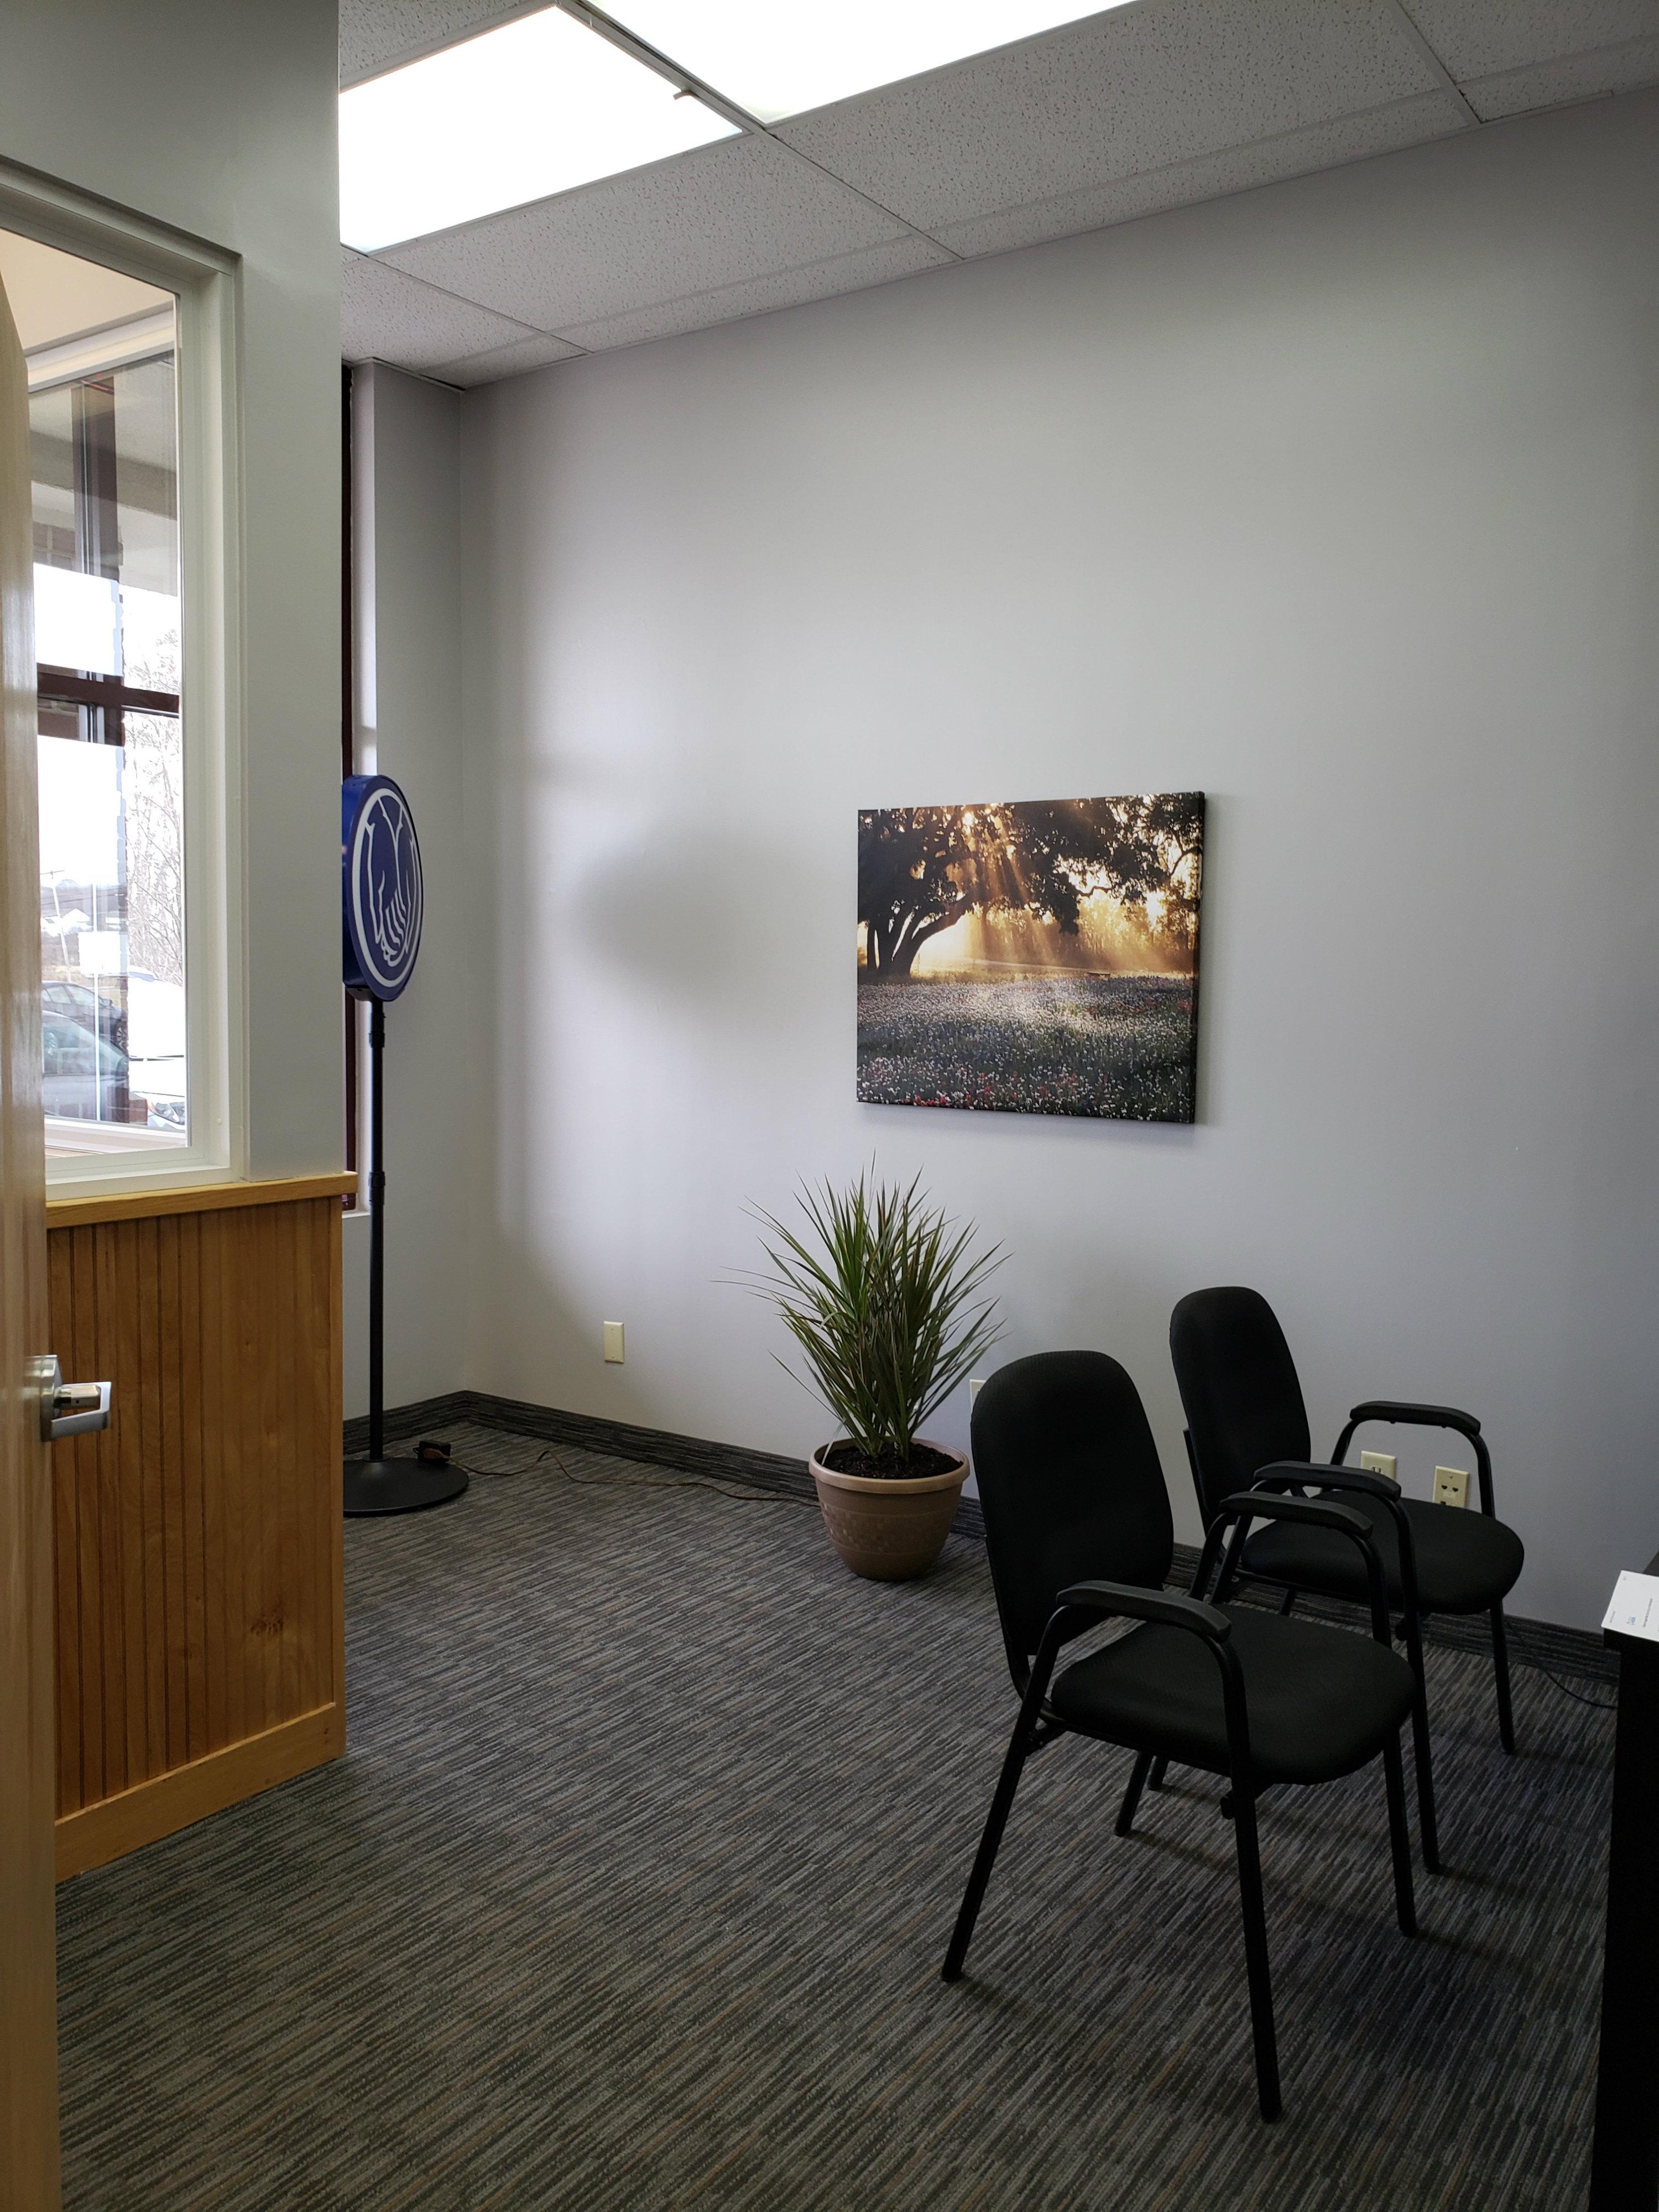 Allstate Insurance Agent: Bob Hecht image 2